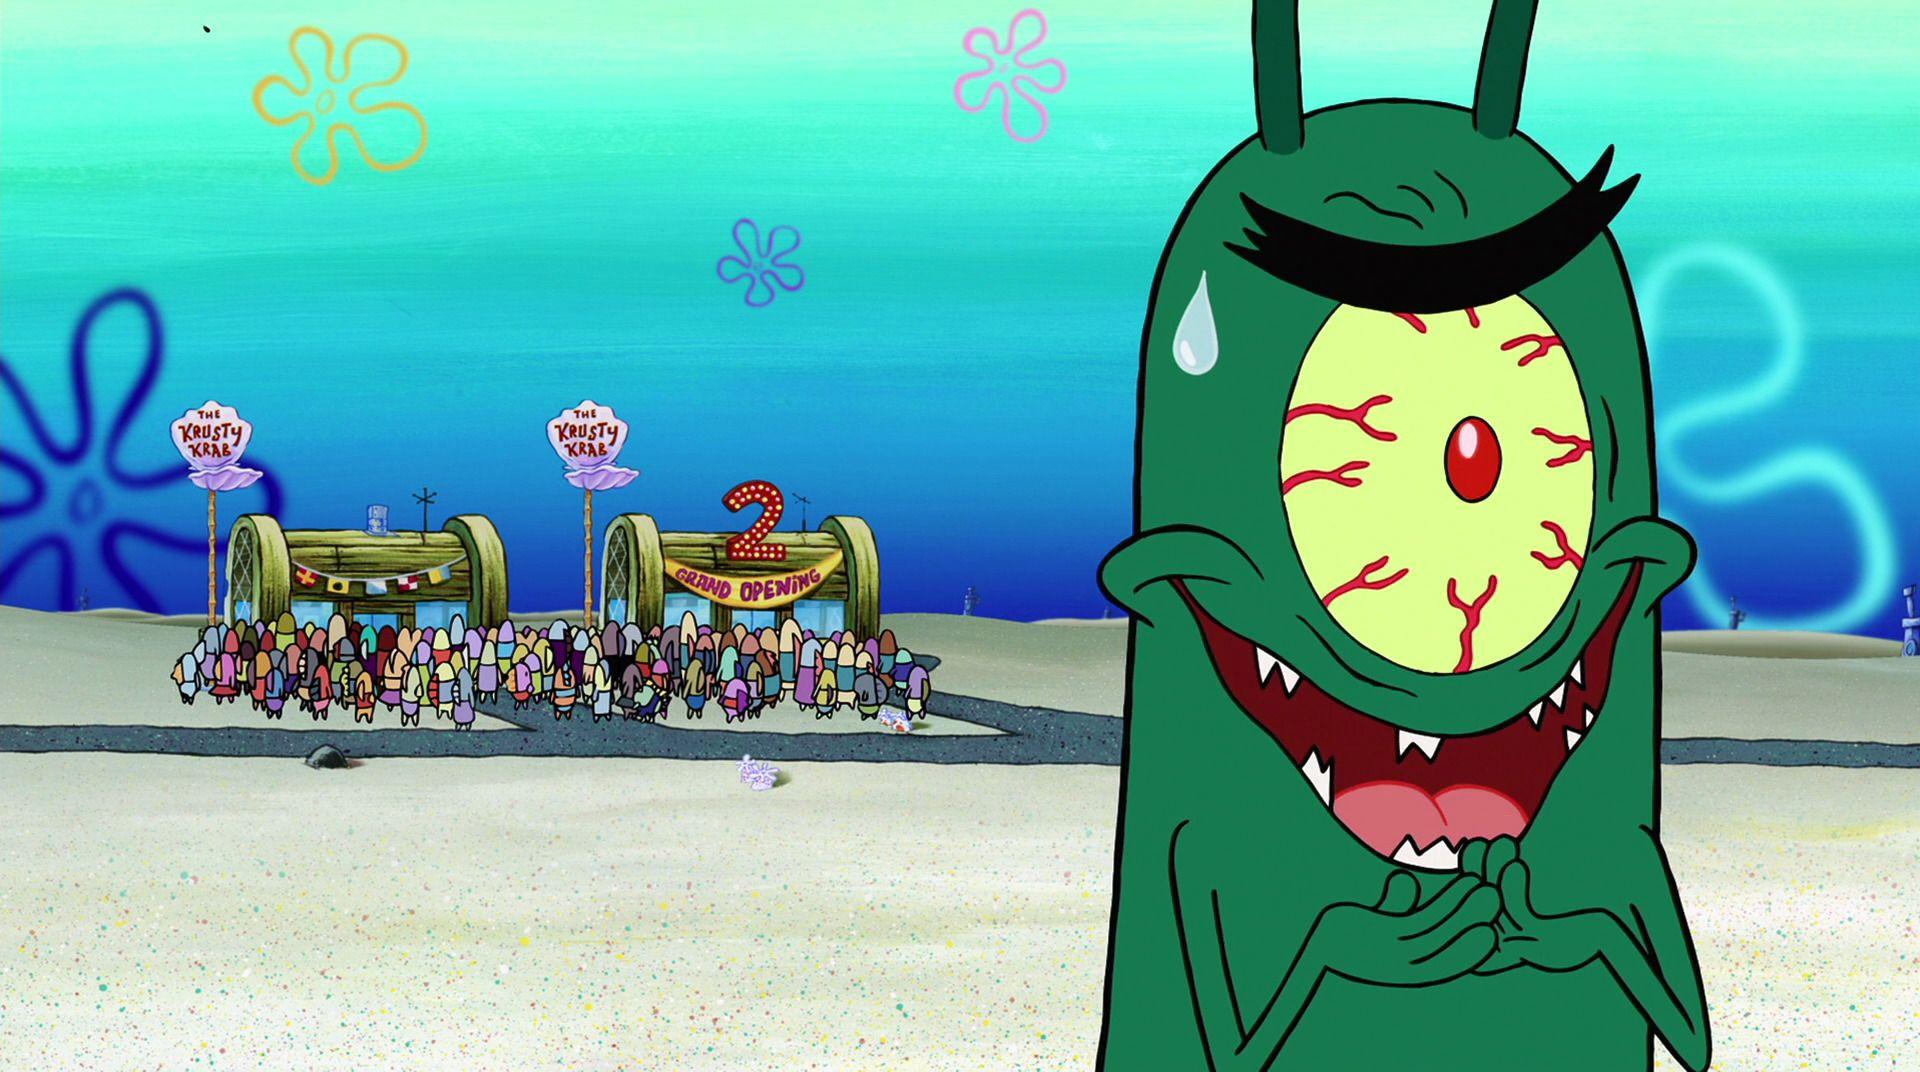 Spongebob Movie Disneyscreencaps